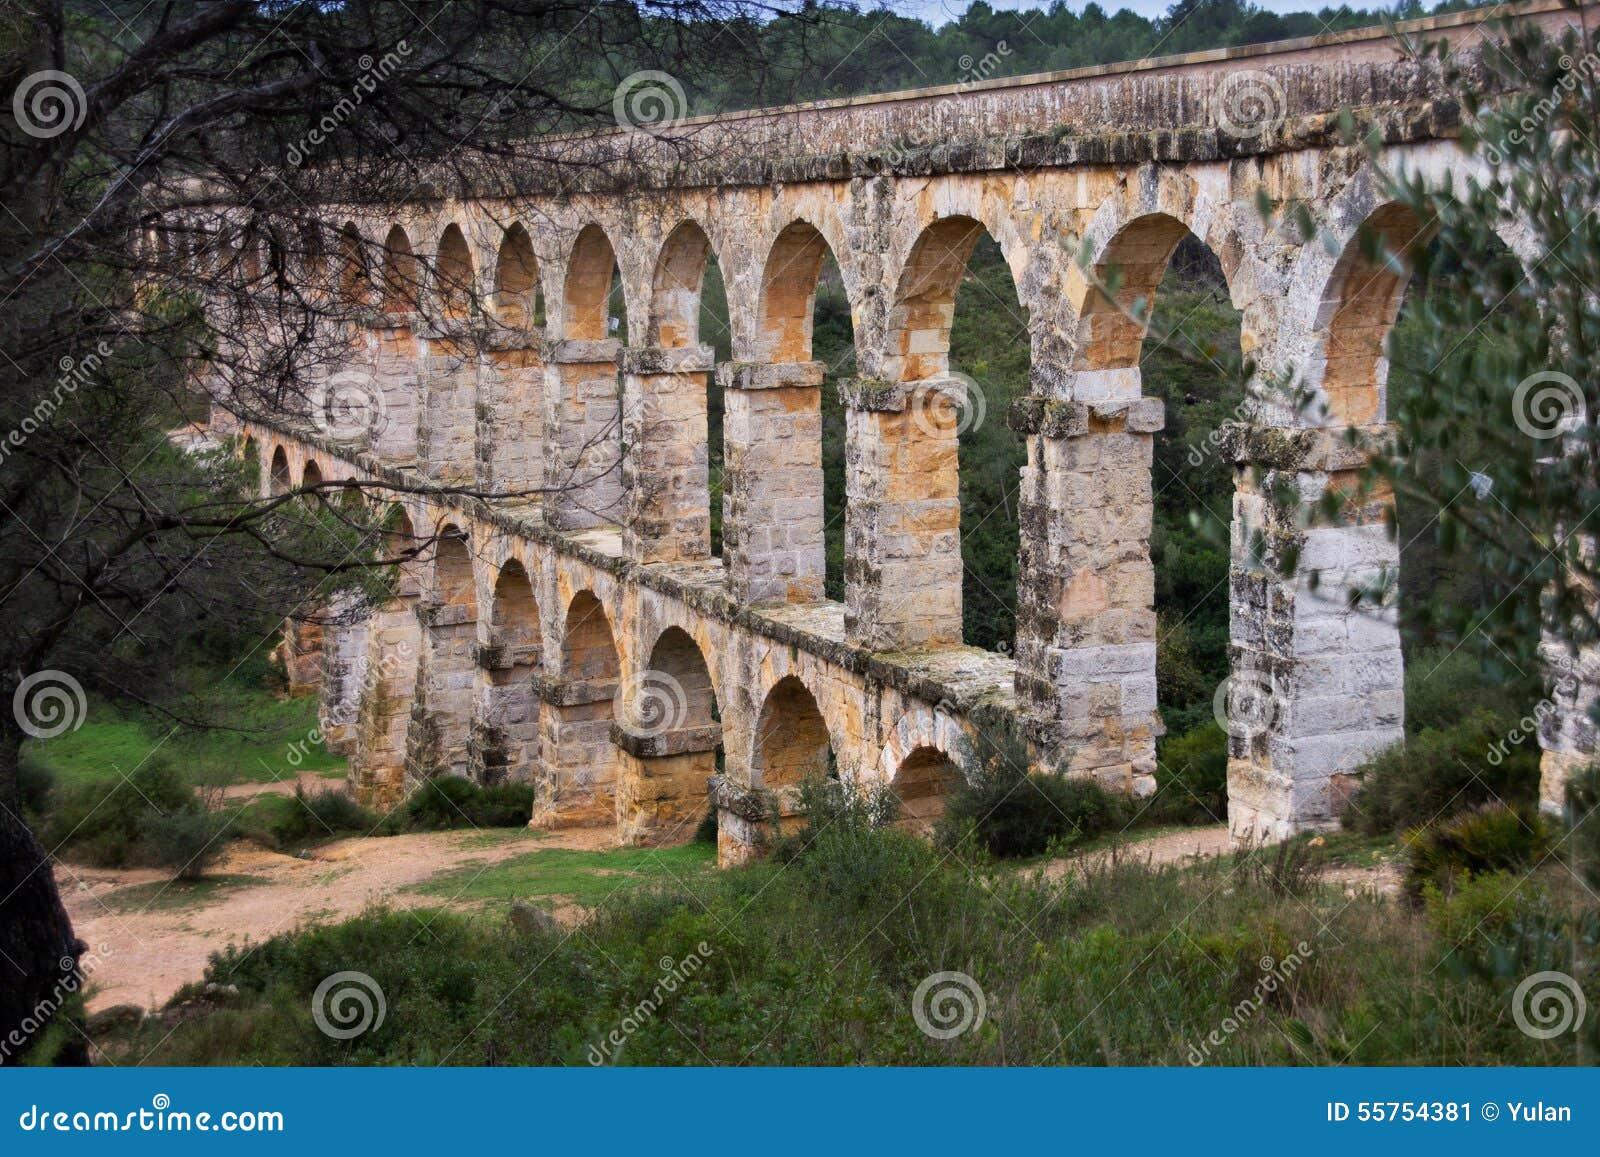 Download Pont Del Diable, Tarragona, Spain Stock Image - Image of building, green: 55754381